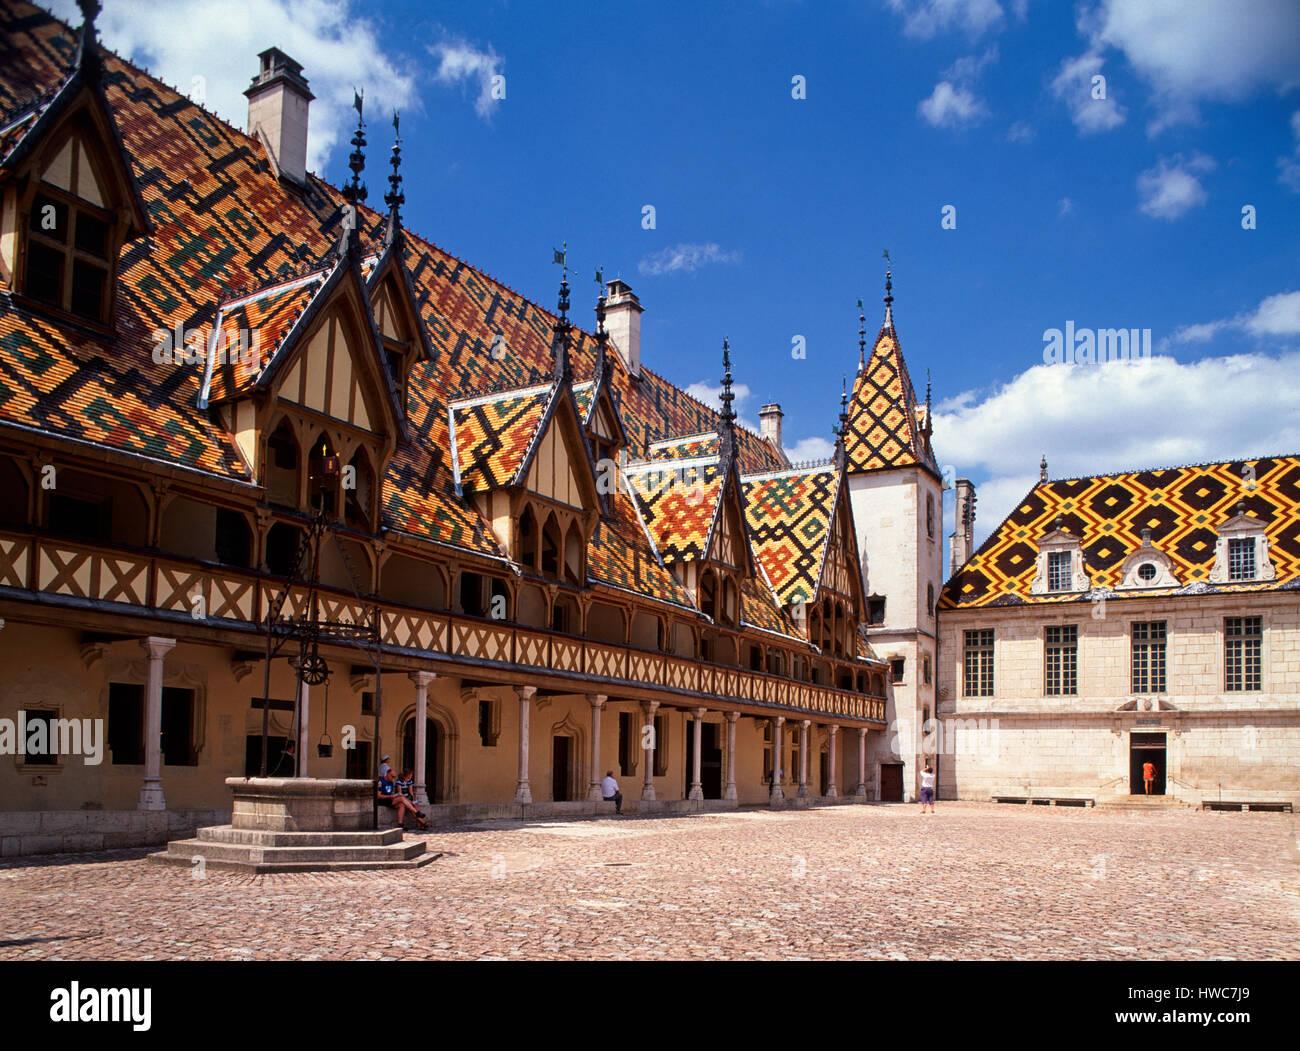 Hospices de Beaune, Beaune, Burgundy, France. - Stock Image